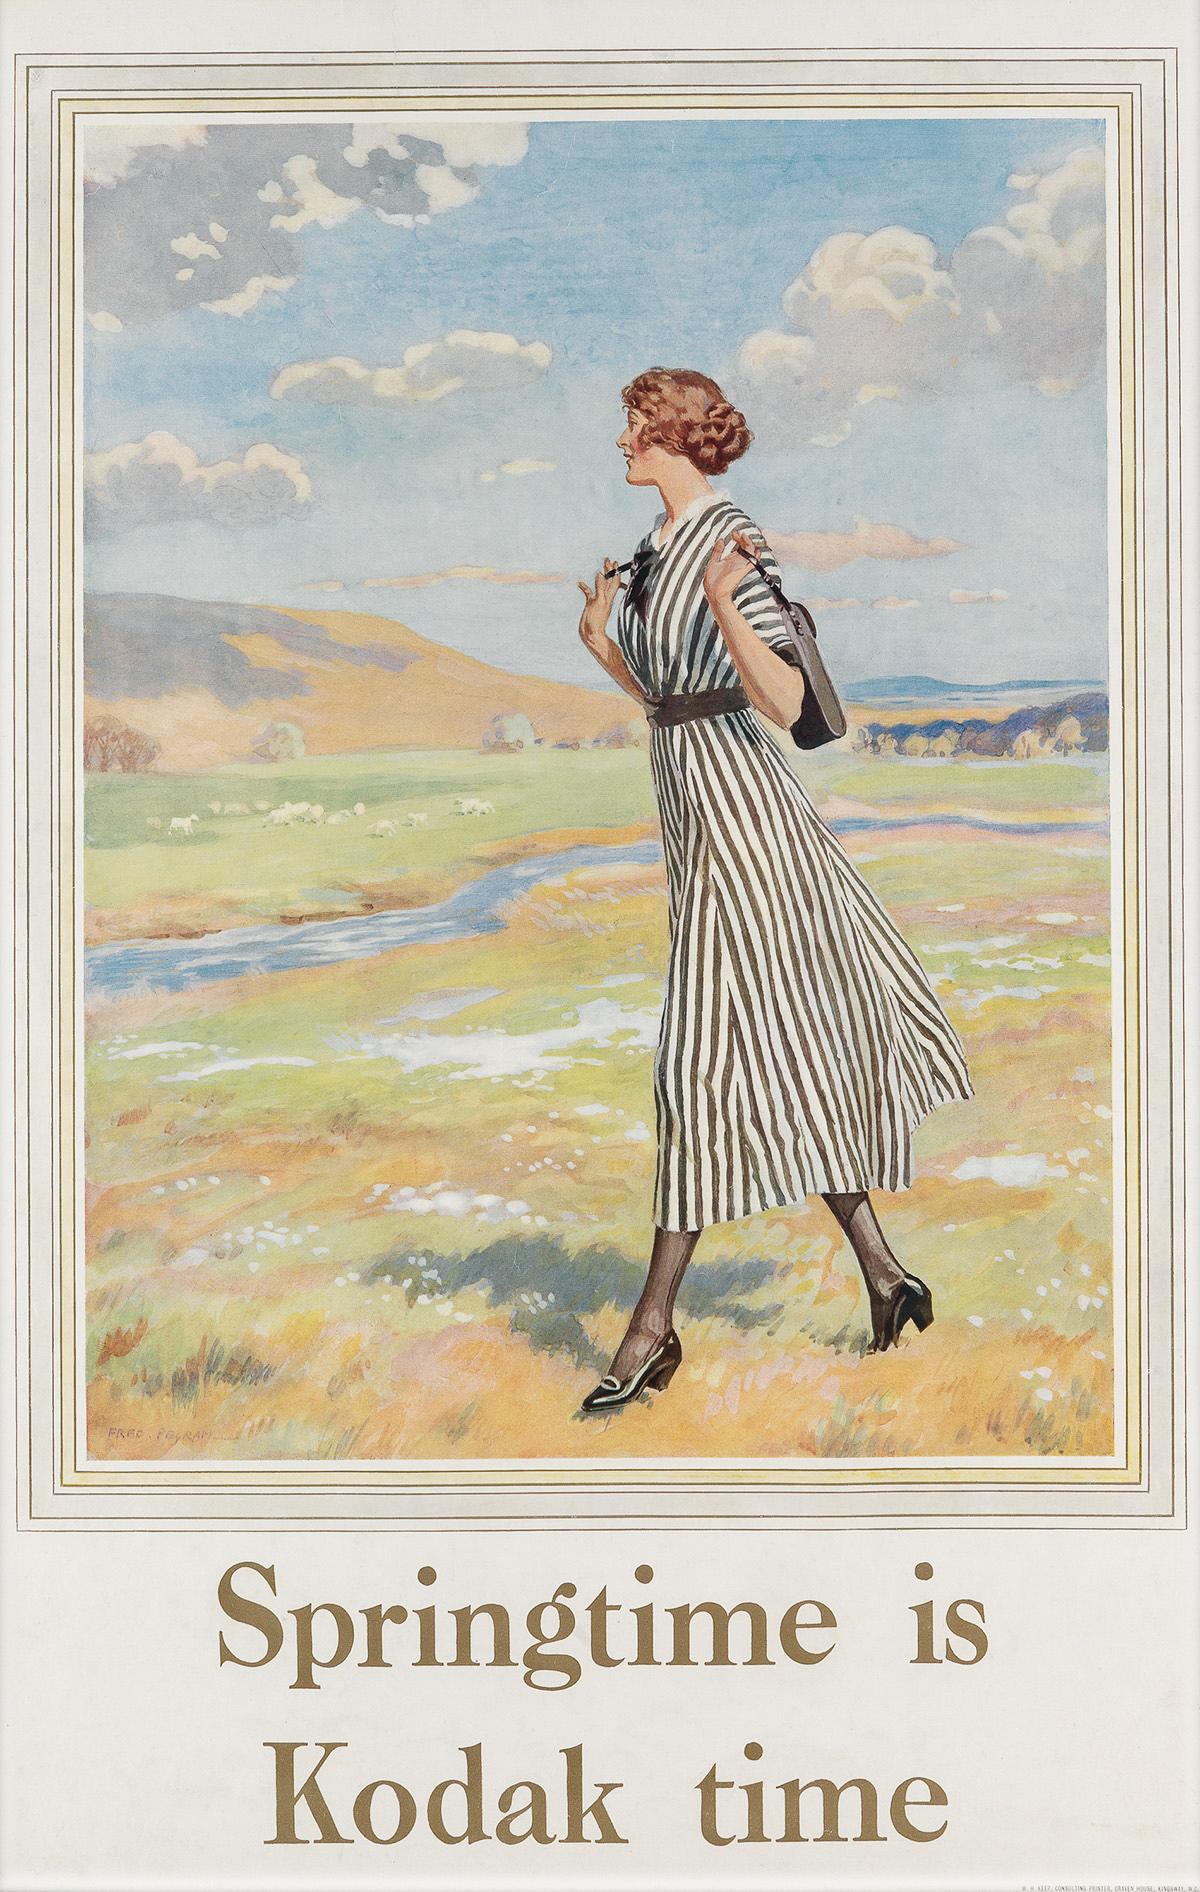 FRED-PEGRAM-(1870-1937)-SPRINGTIME-IS-KODAK-TIME-Circa-1920s-30x19-inches-76x49-cm-WH-Keep-[London]